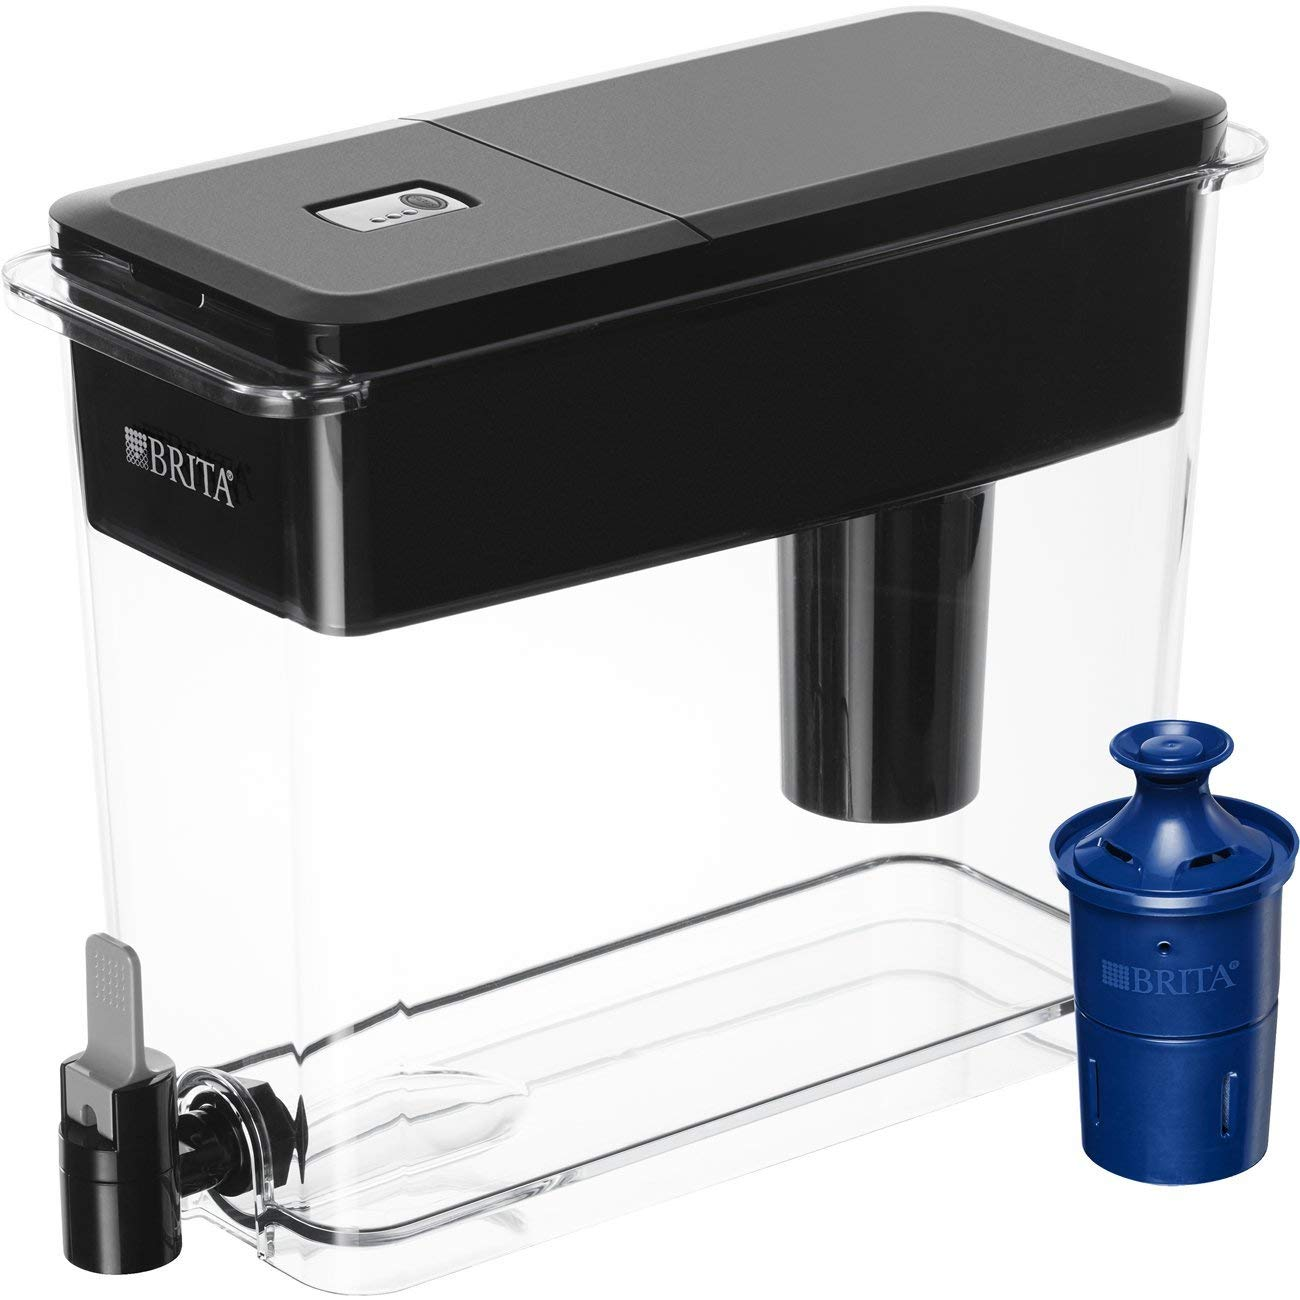 Brita filter and dispenser $37.00